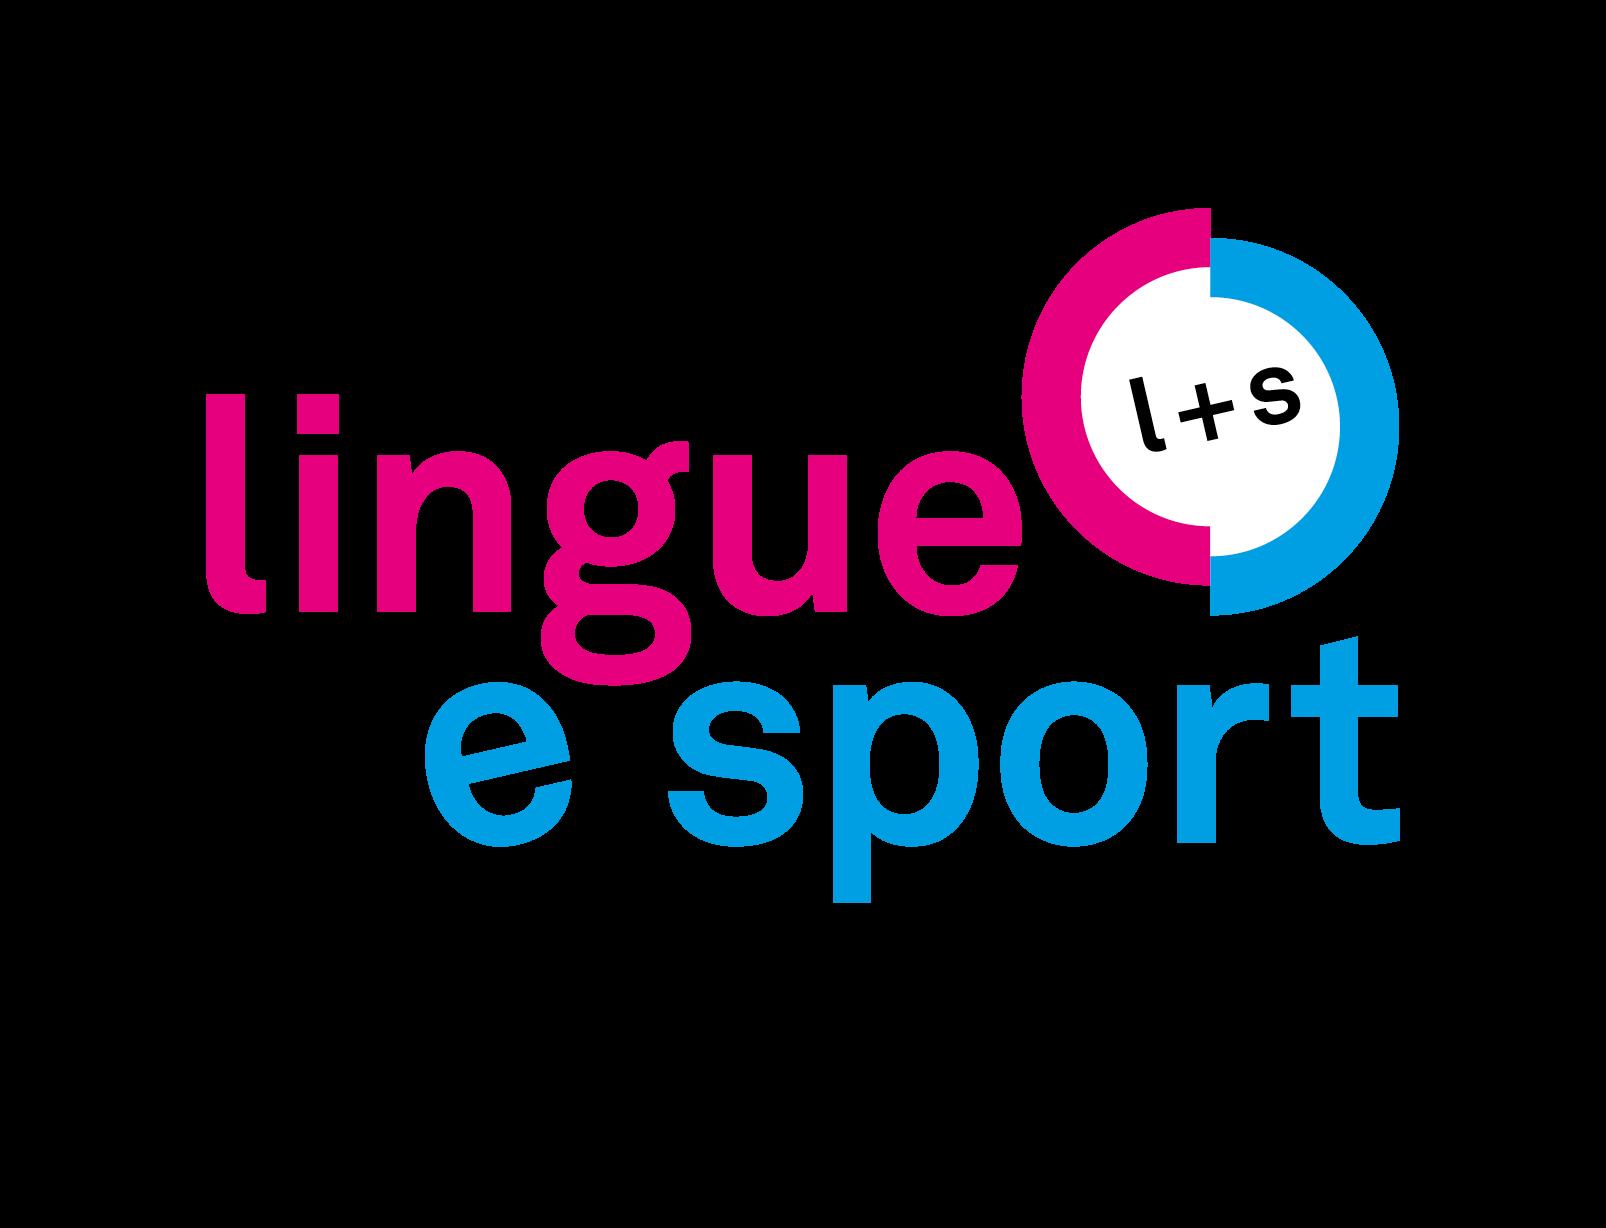 Lingue e Sport - Bellinzona 2